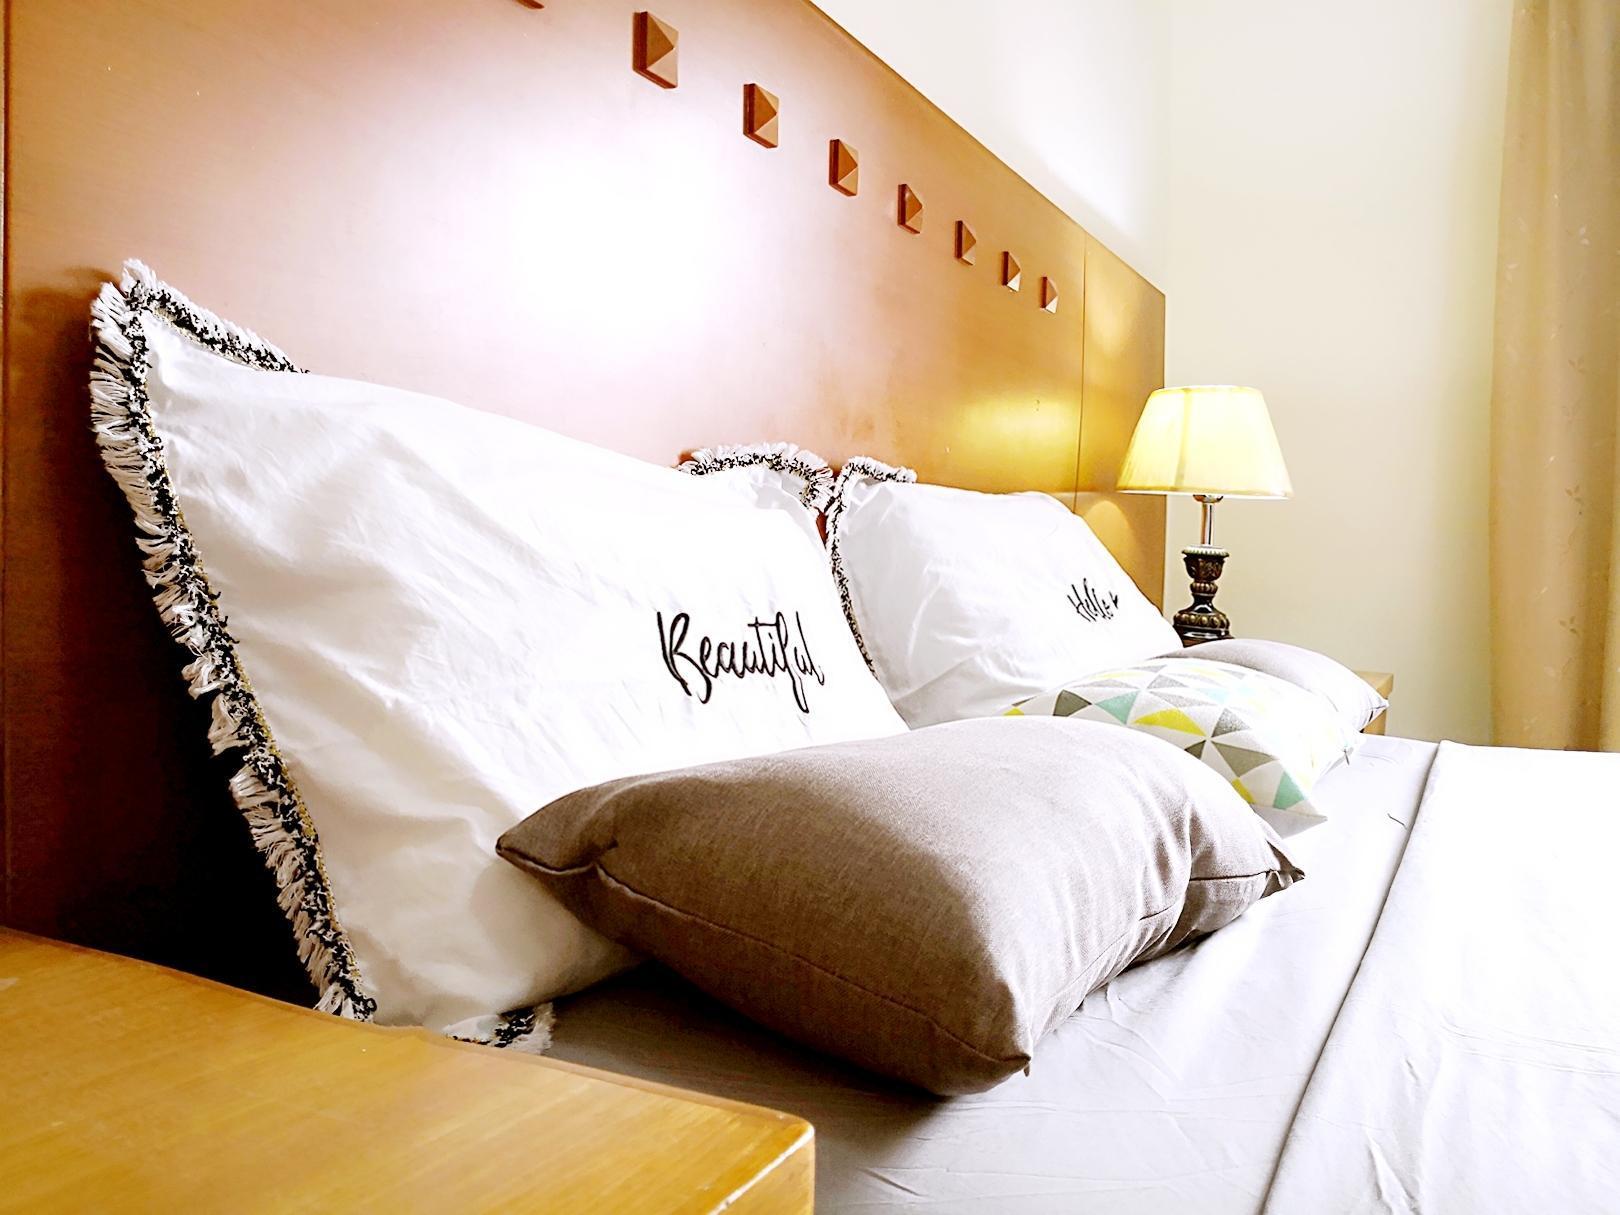 KK Town Comfort Home Stay 6pax 3BRD